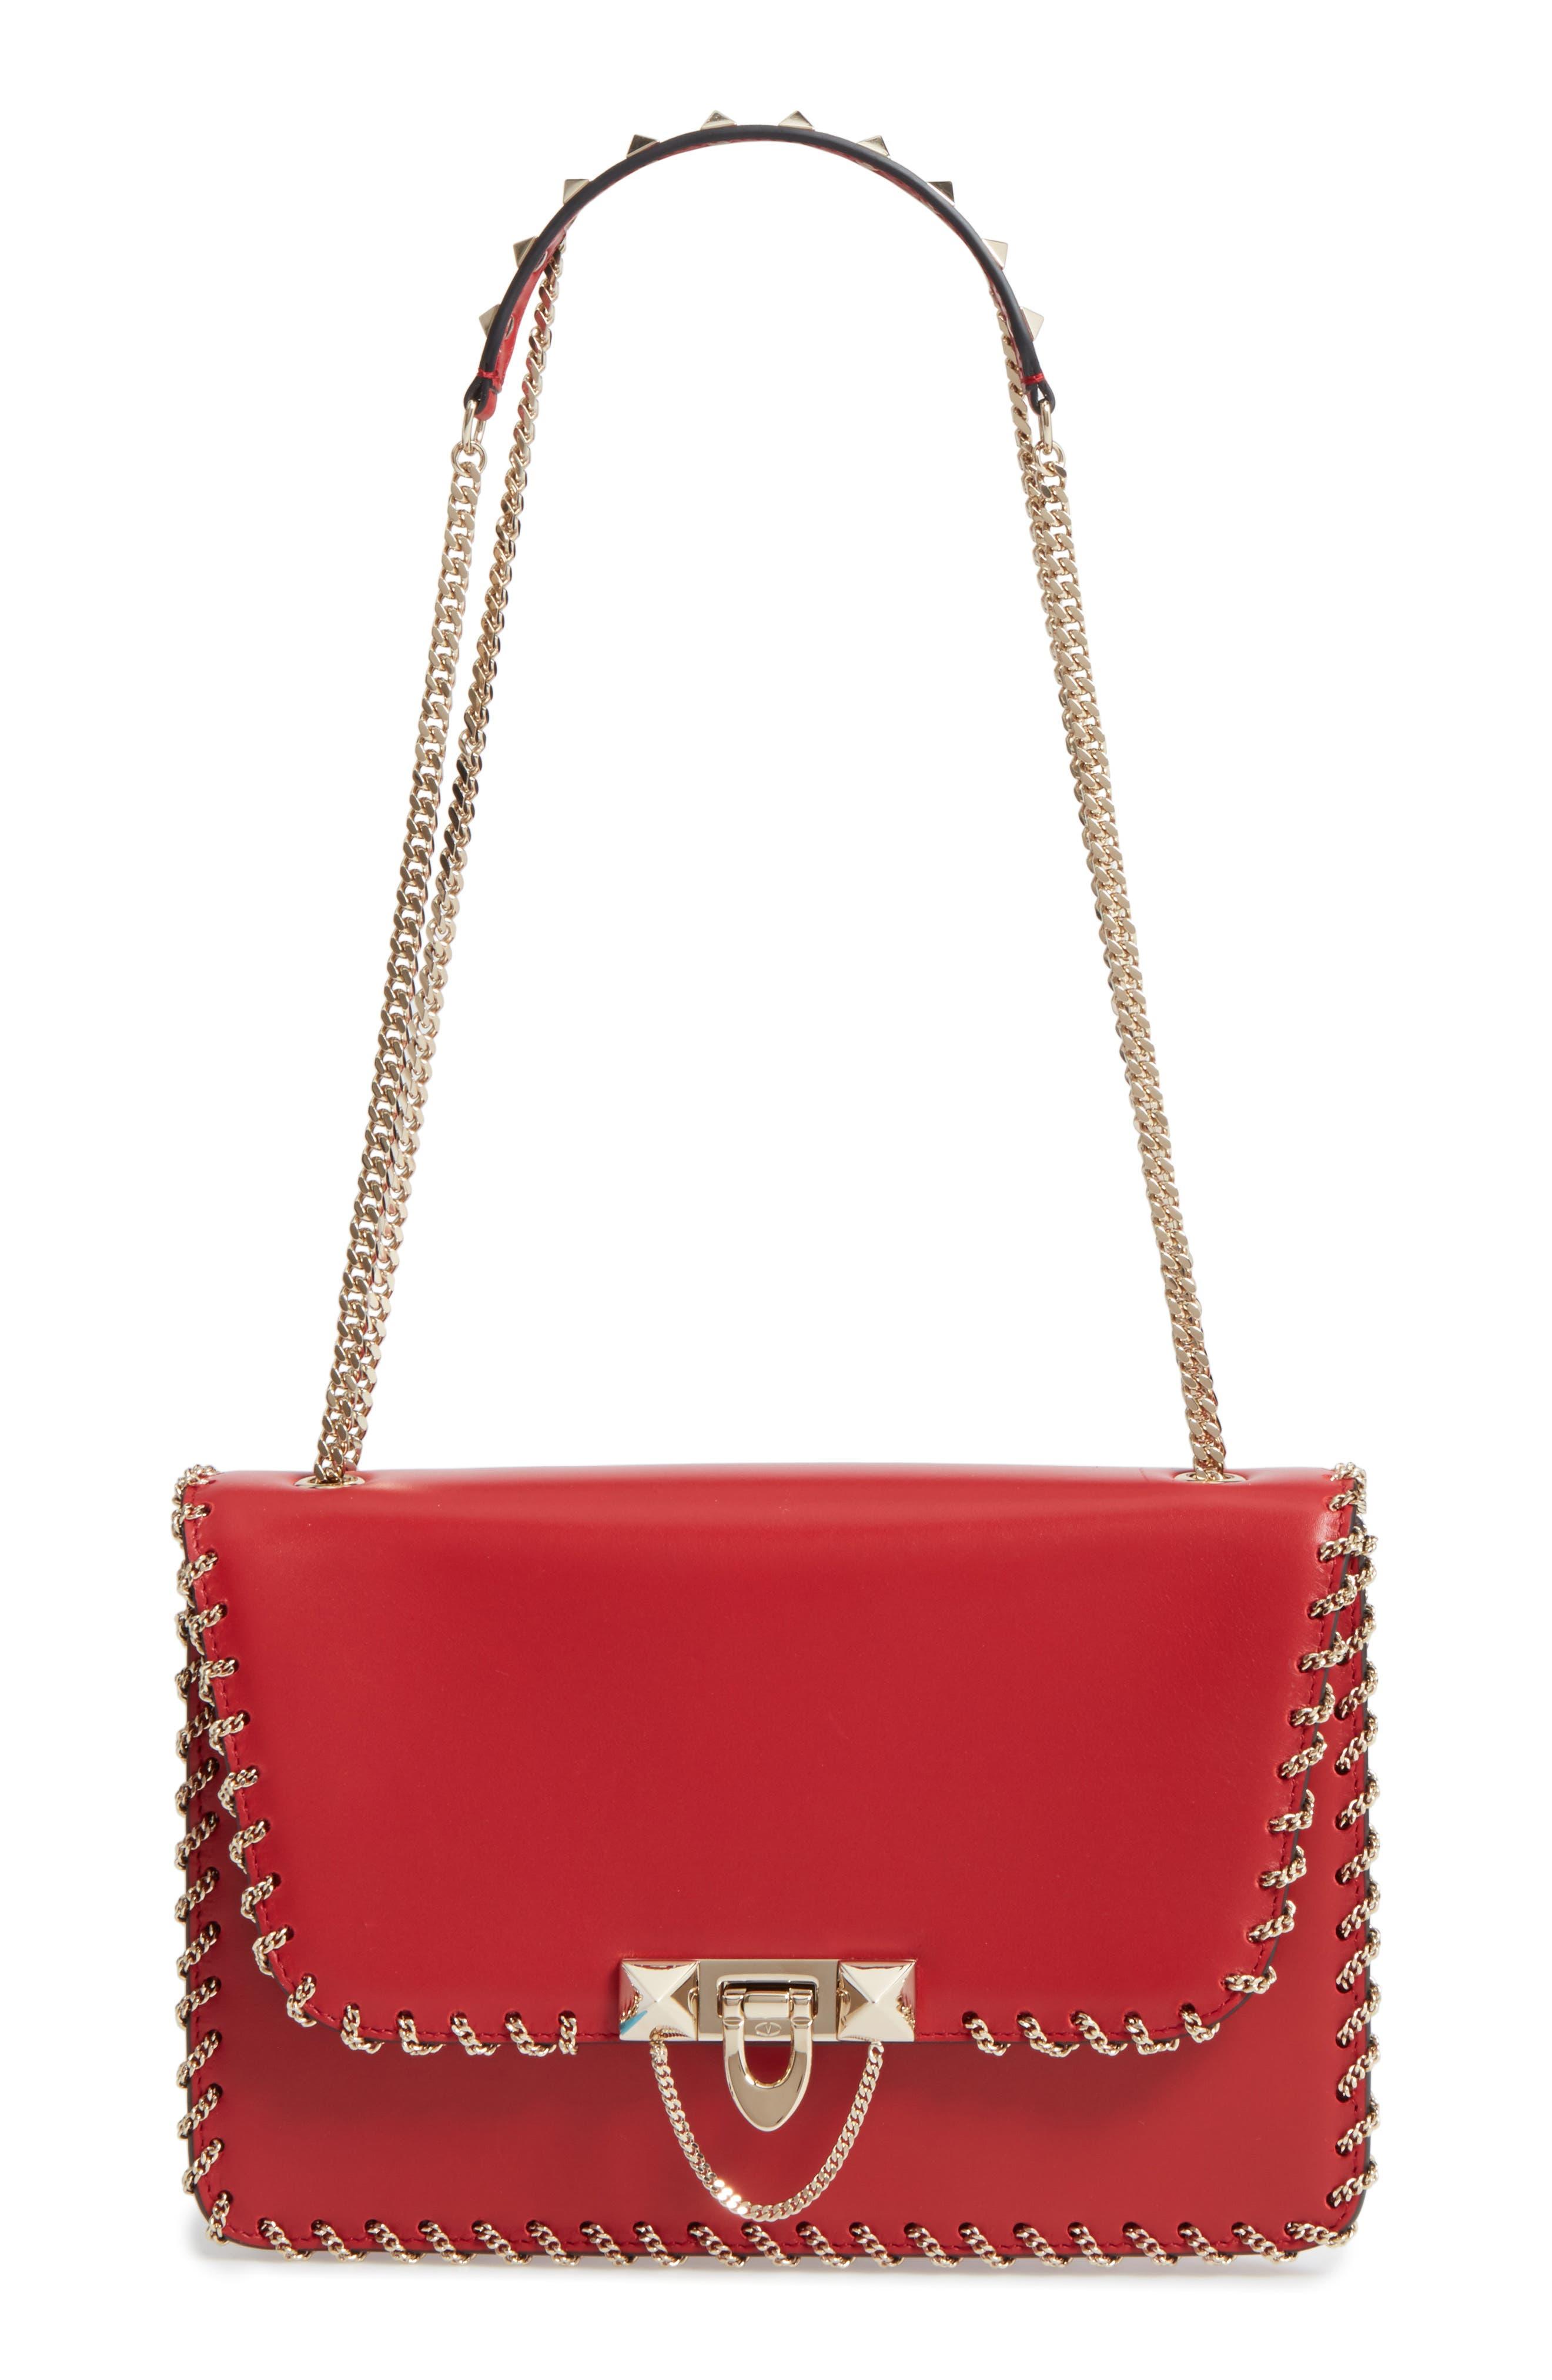 Alternate Image 1 Selected - VALENTINO GARAVANI Demilune Whipstitch Leather Shoulder Bag